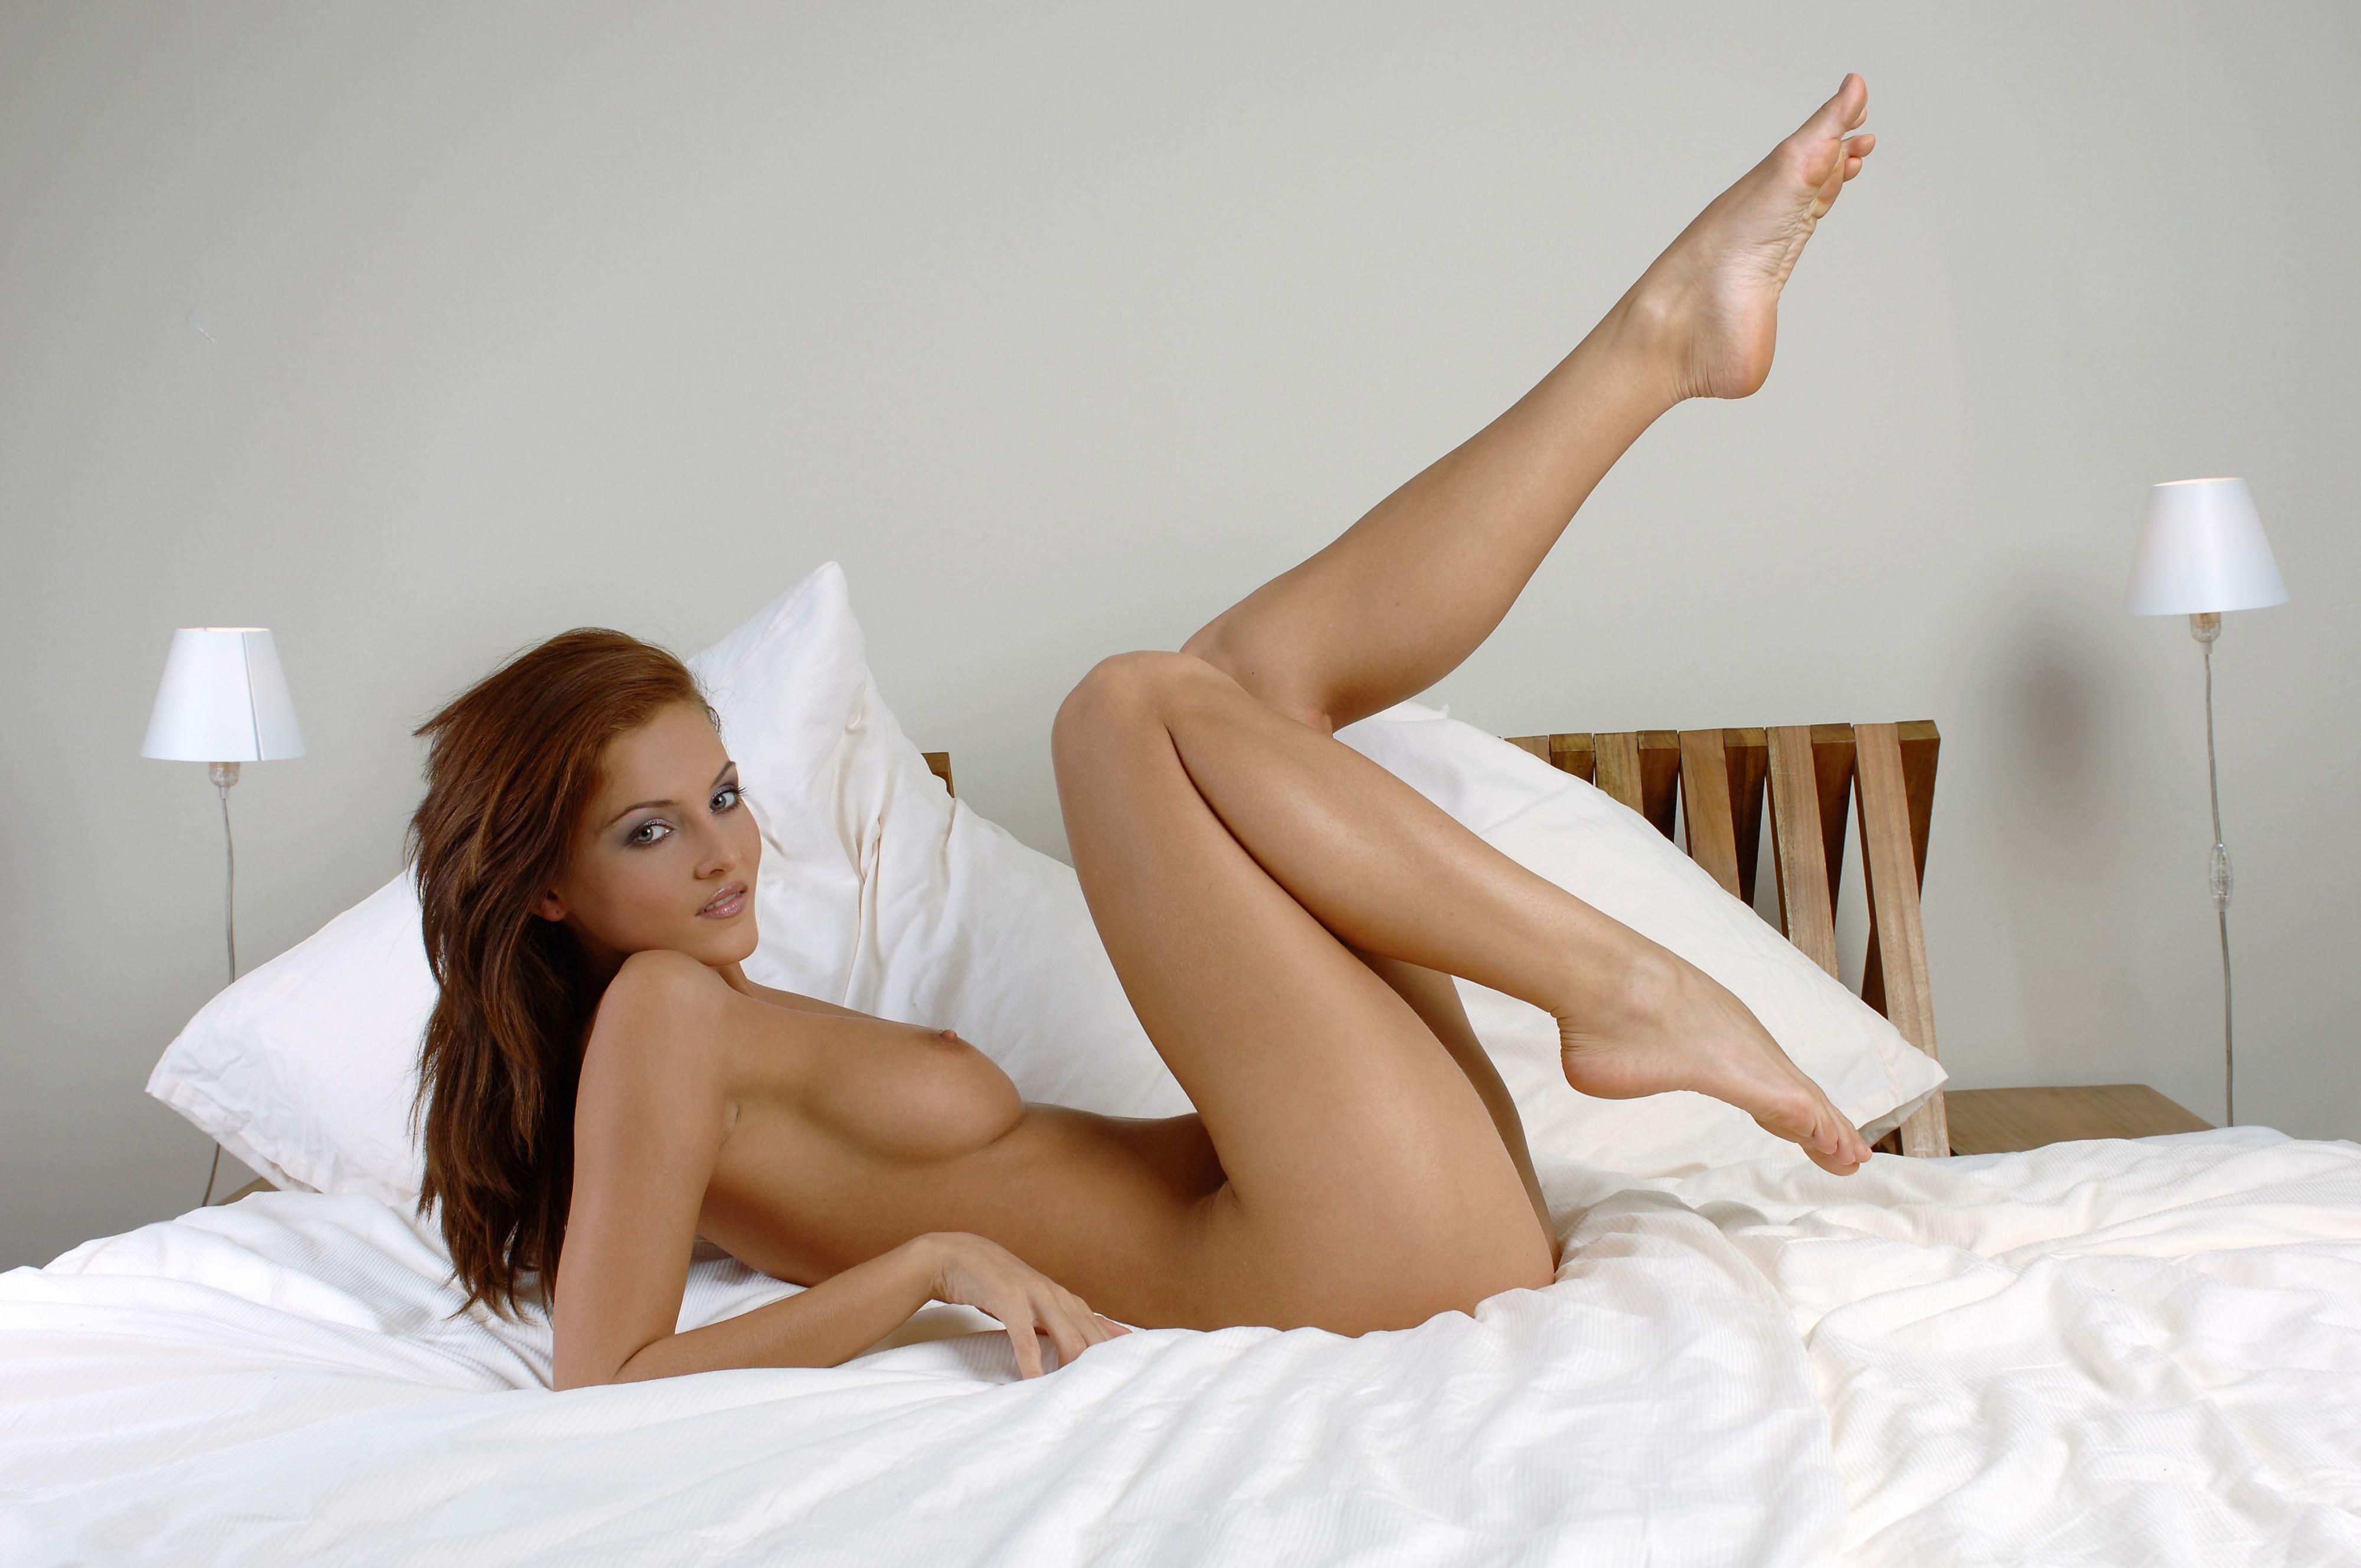 Nude asian girl spreading legs